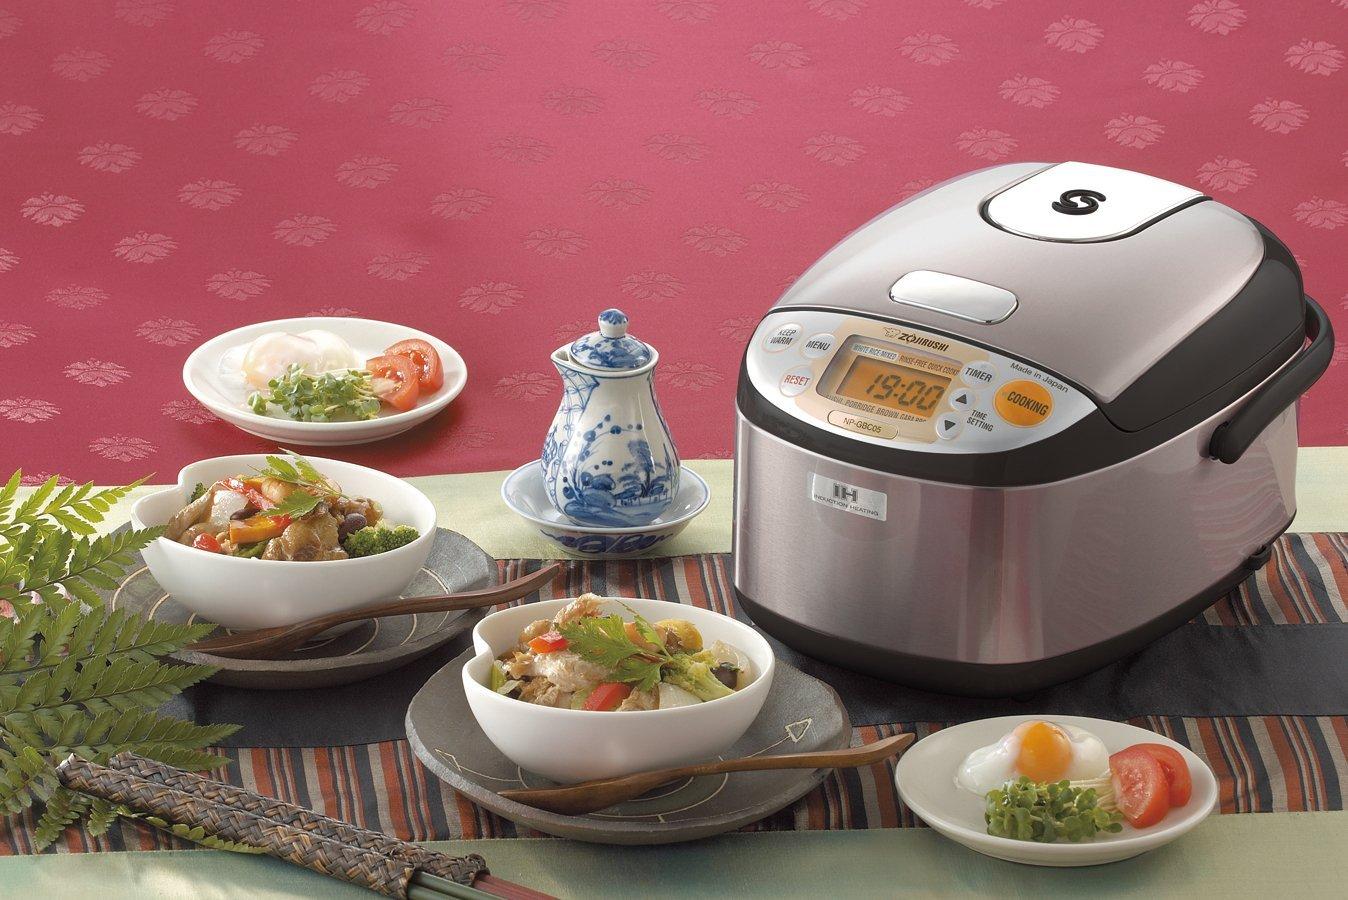 3 Zojirushi Induction Rice Cookers: Nphcc Vs Npgbc05 Vs Nphbc How To Cook